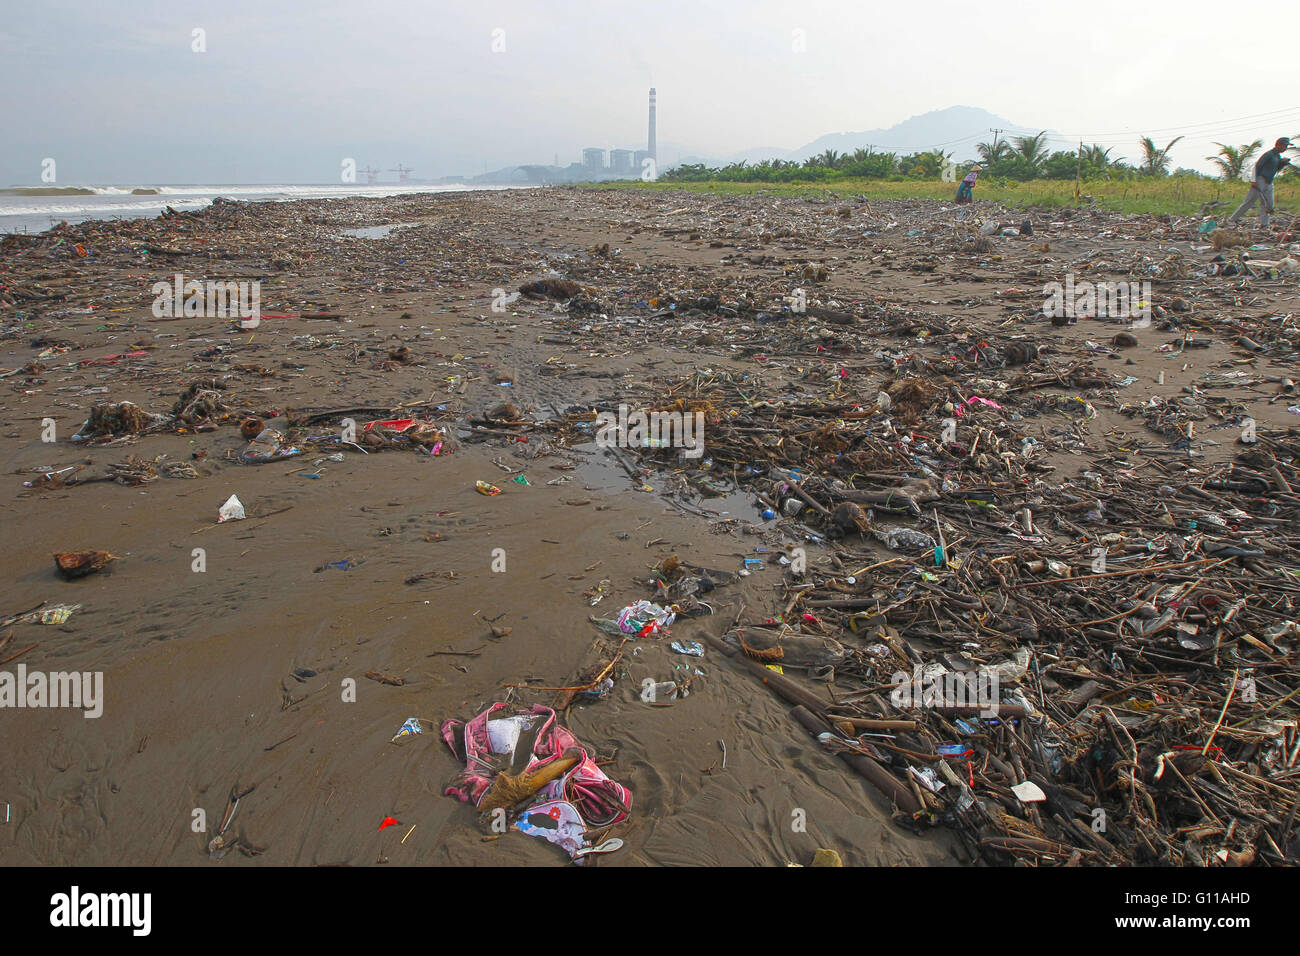 Sukabumi, West Java, Indonesia. 5th May, 2016. Garbage on Loji beach, Sukabumi, West Java. Marine debris is mainly - Stock Image